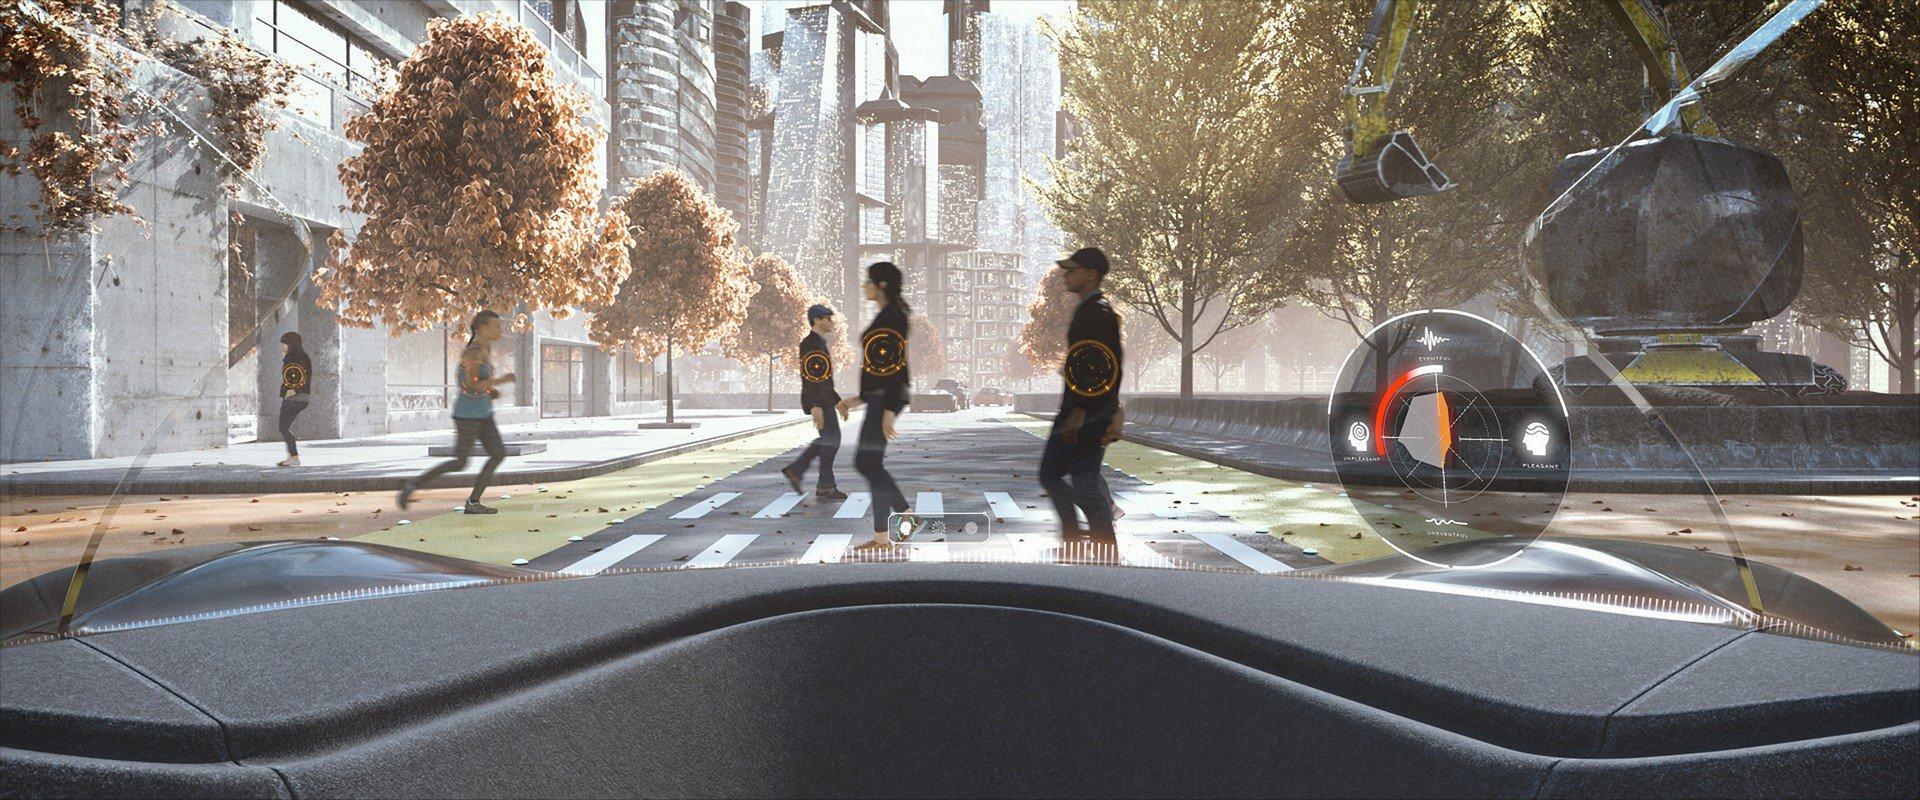 Bentley Future Cars 2050 (6)